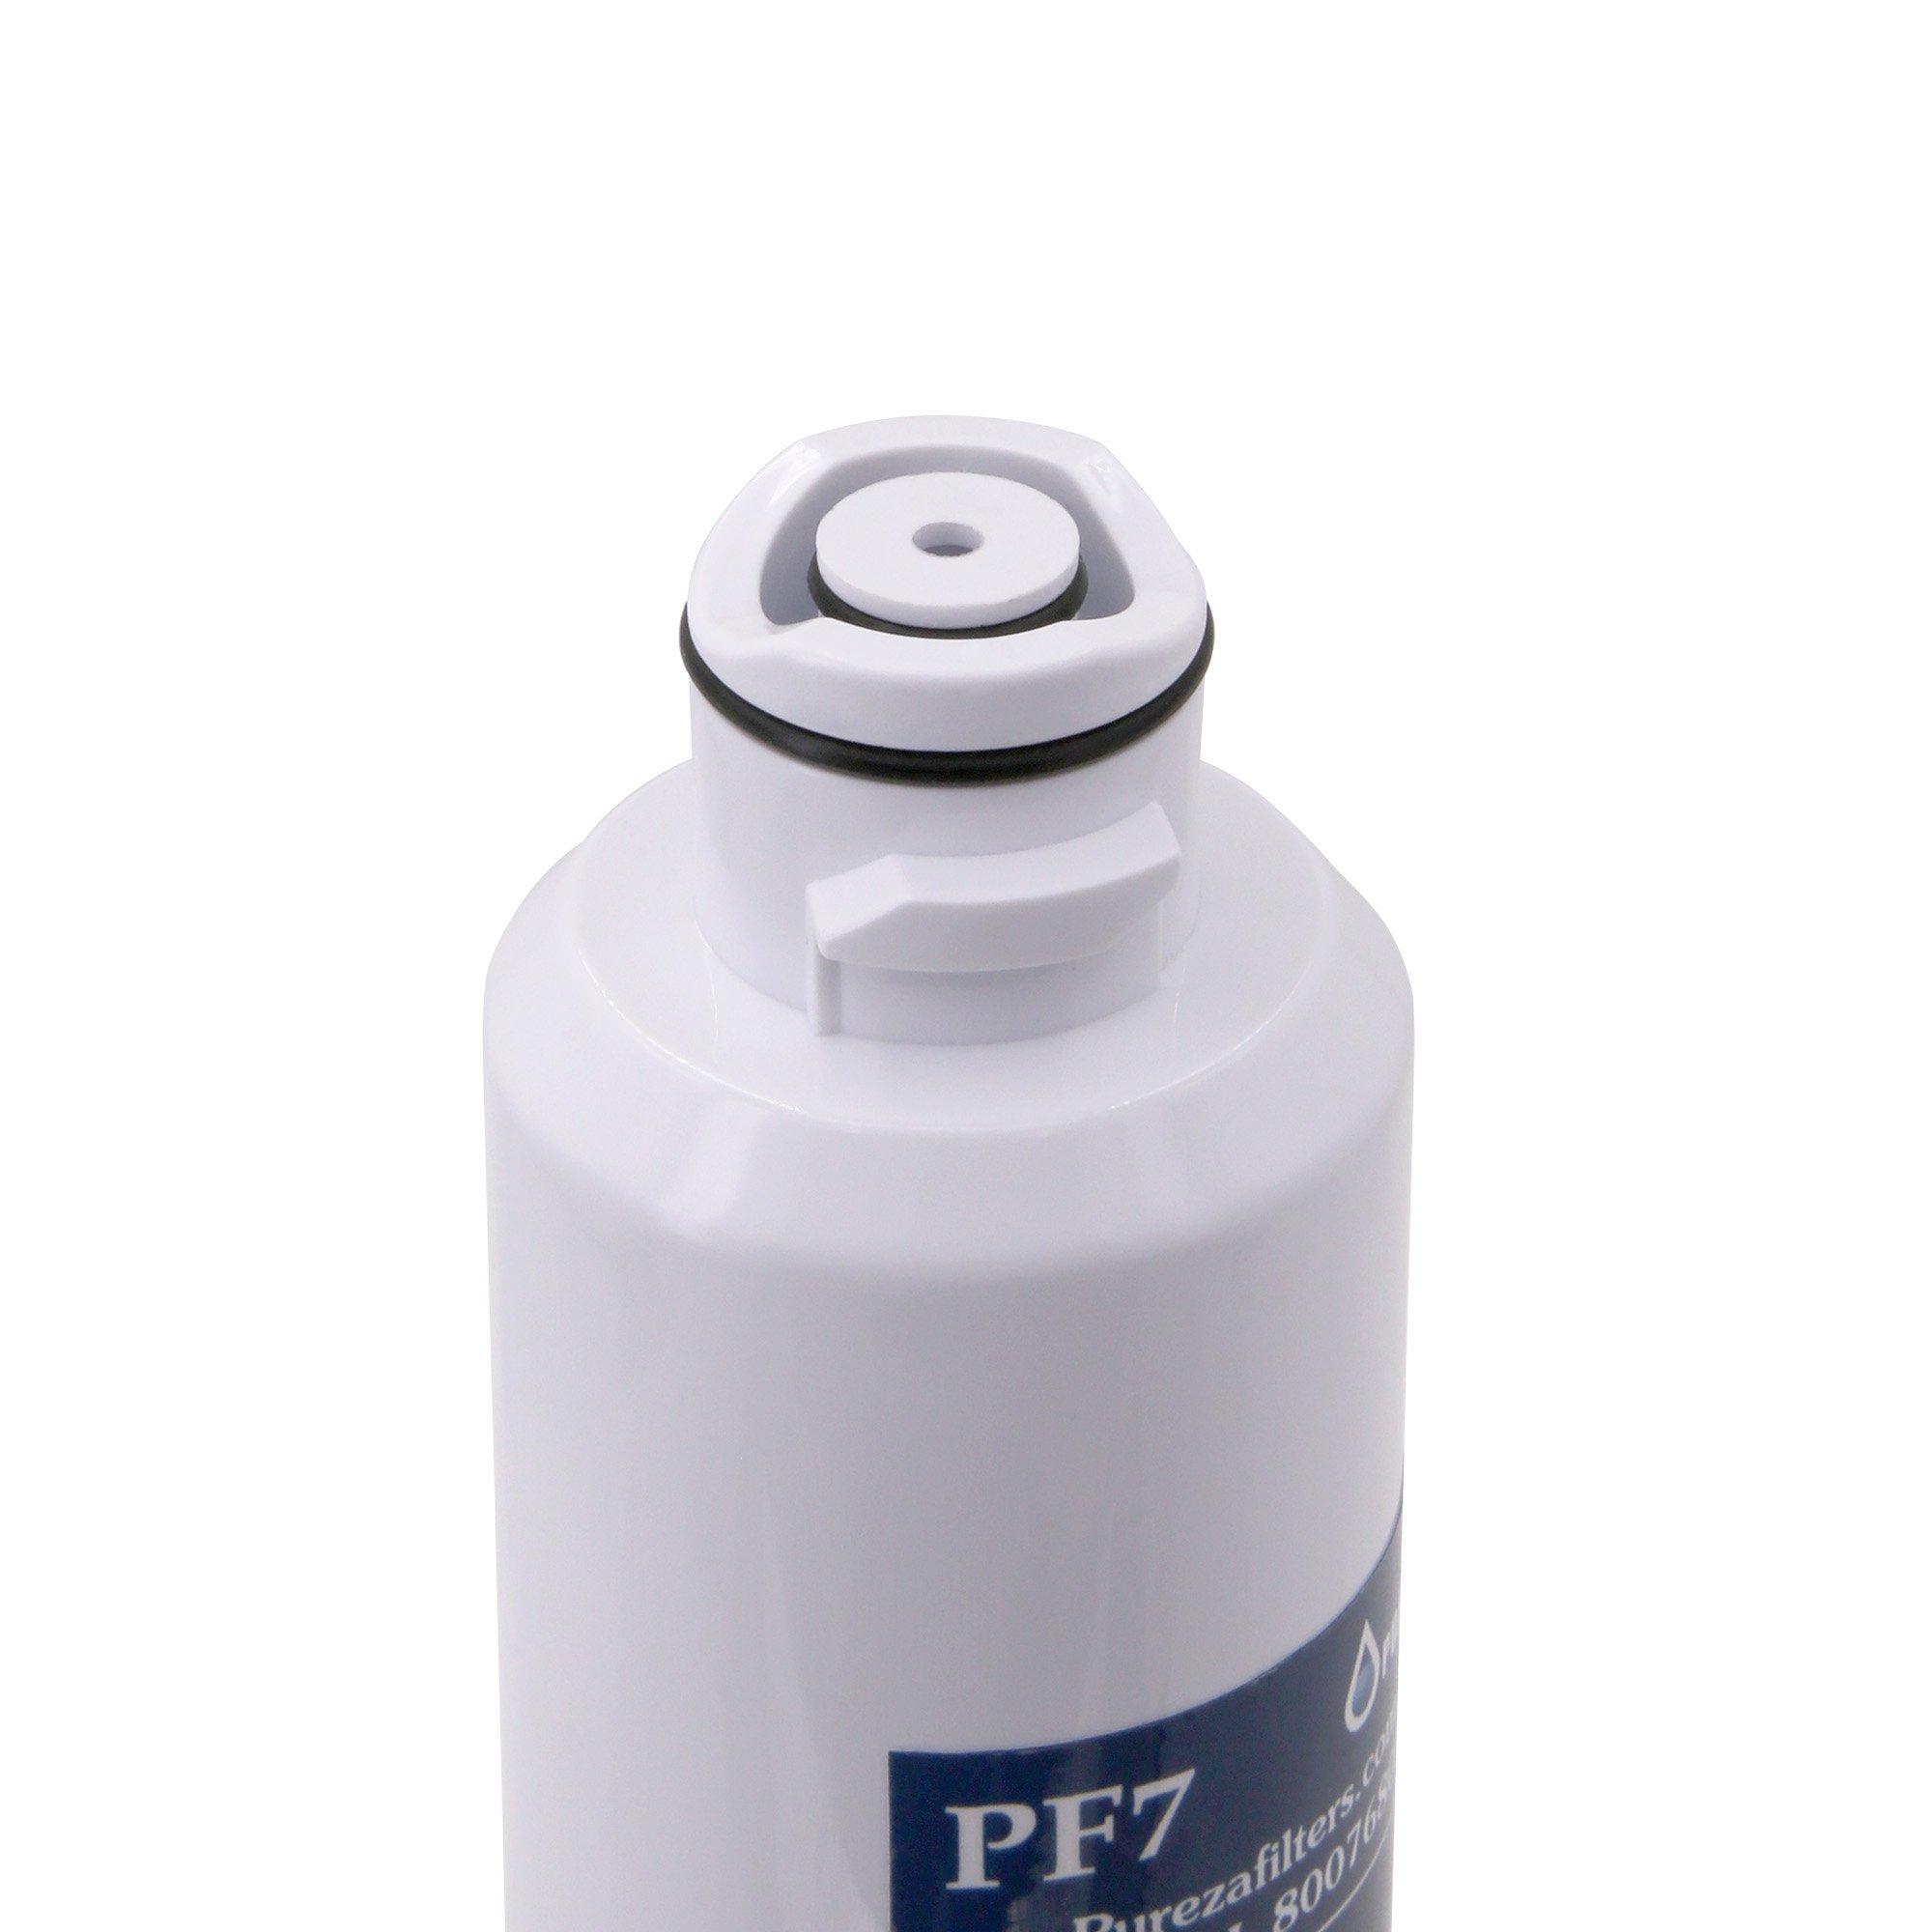 DA29-00020B Fits for Samsung DA29-00020B Water Filter- Also Fits DA29-00020A, HAF-CIN/EXP, 46-9101 Refrigerator Water Filter by Pureza filters (Image #4)